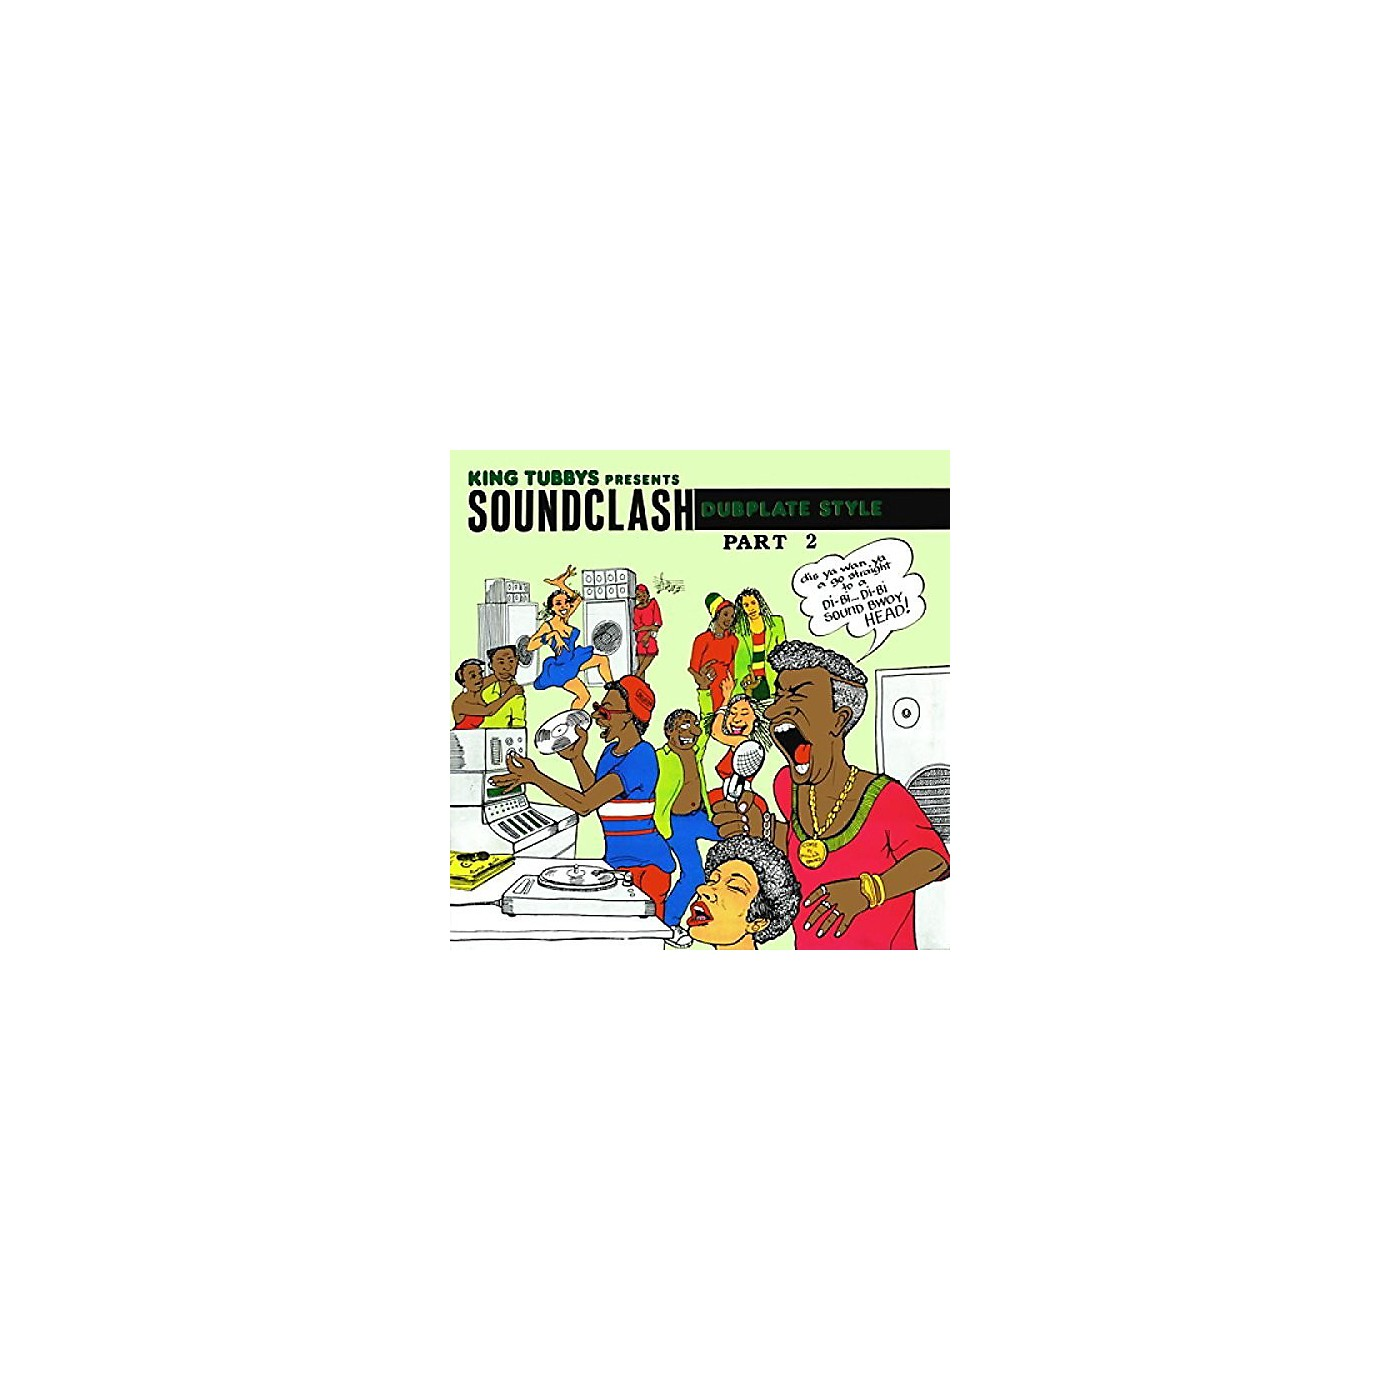 Alliance King Tubby - King Tubbys Presents: Soundclash Dubplate Style Part 2 thumbnail